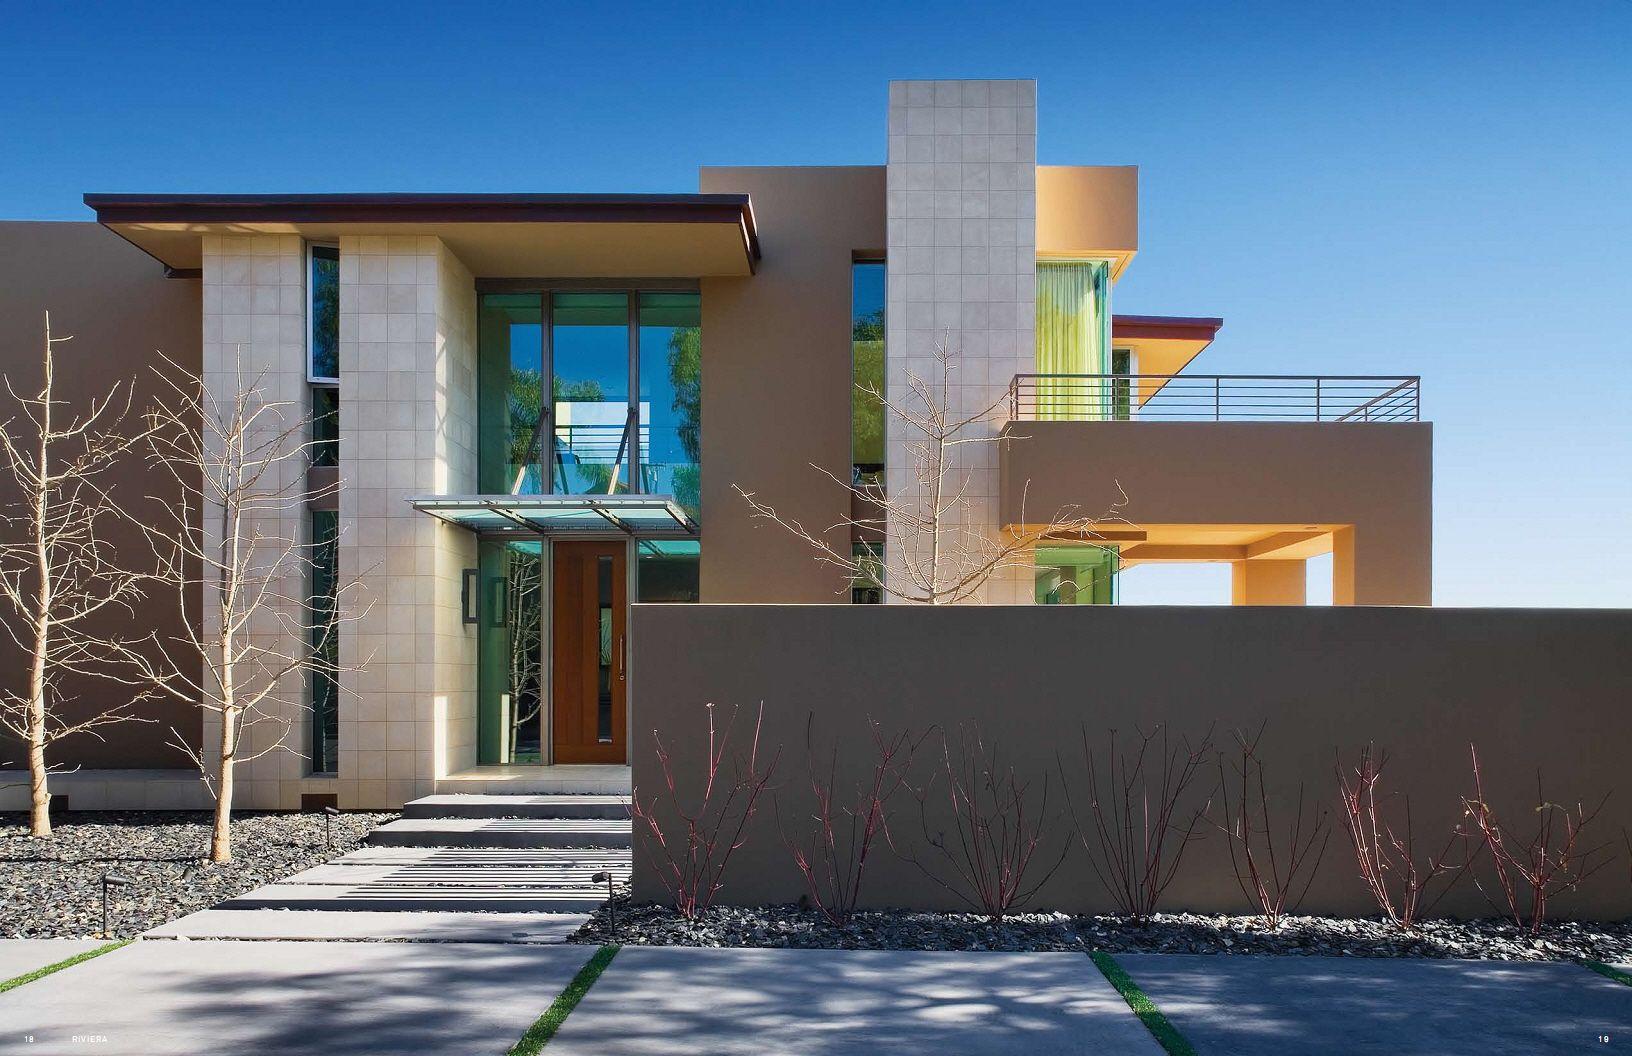 Rivera Residence By Shubin U0026 Donaldson